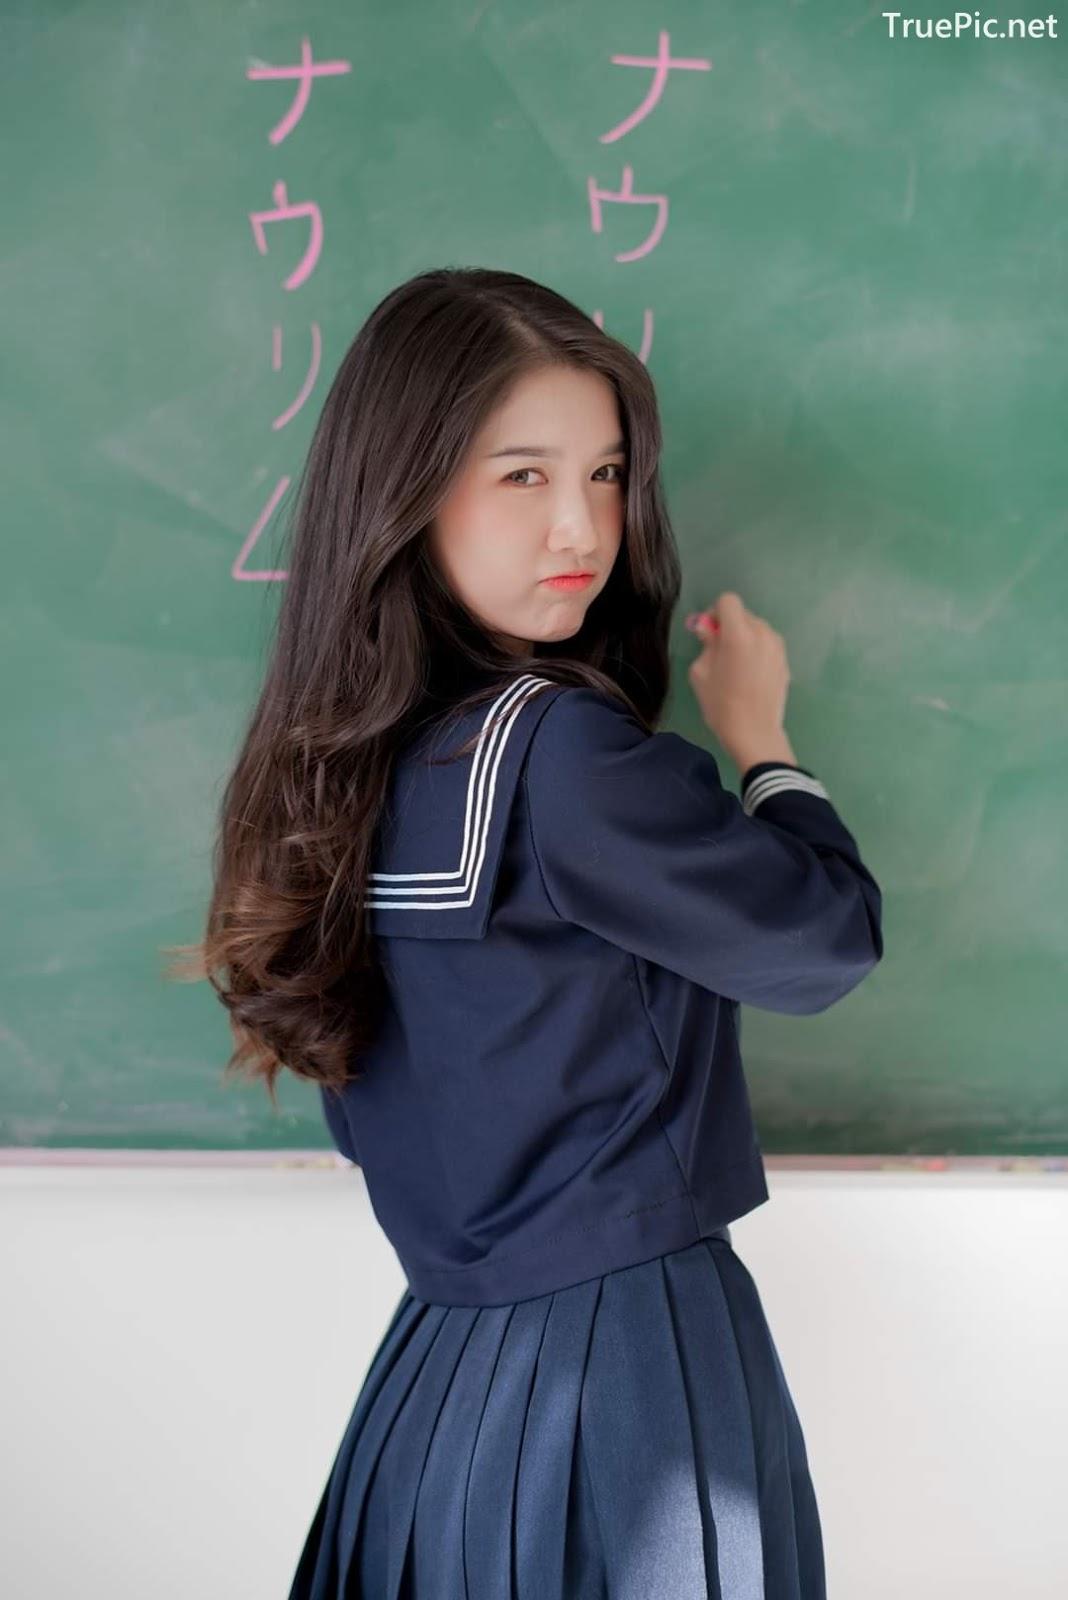 Image Thailand Cute Model - Yatawee Limsiripothong - Missing School - TruePic.net - Picture-1